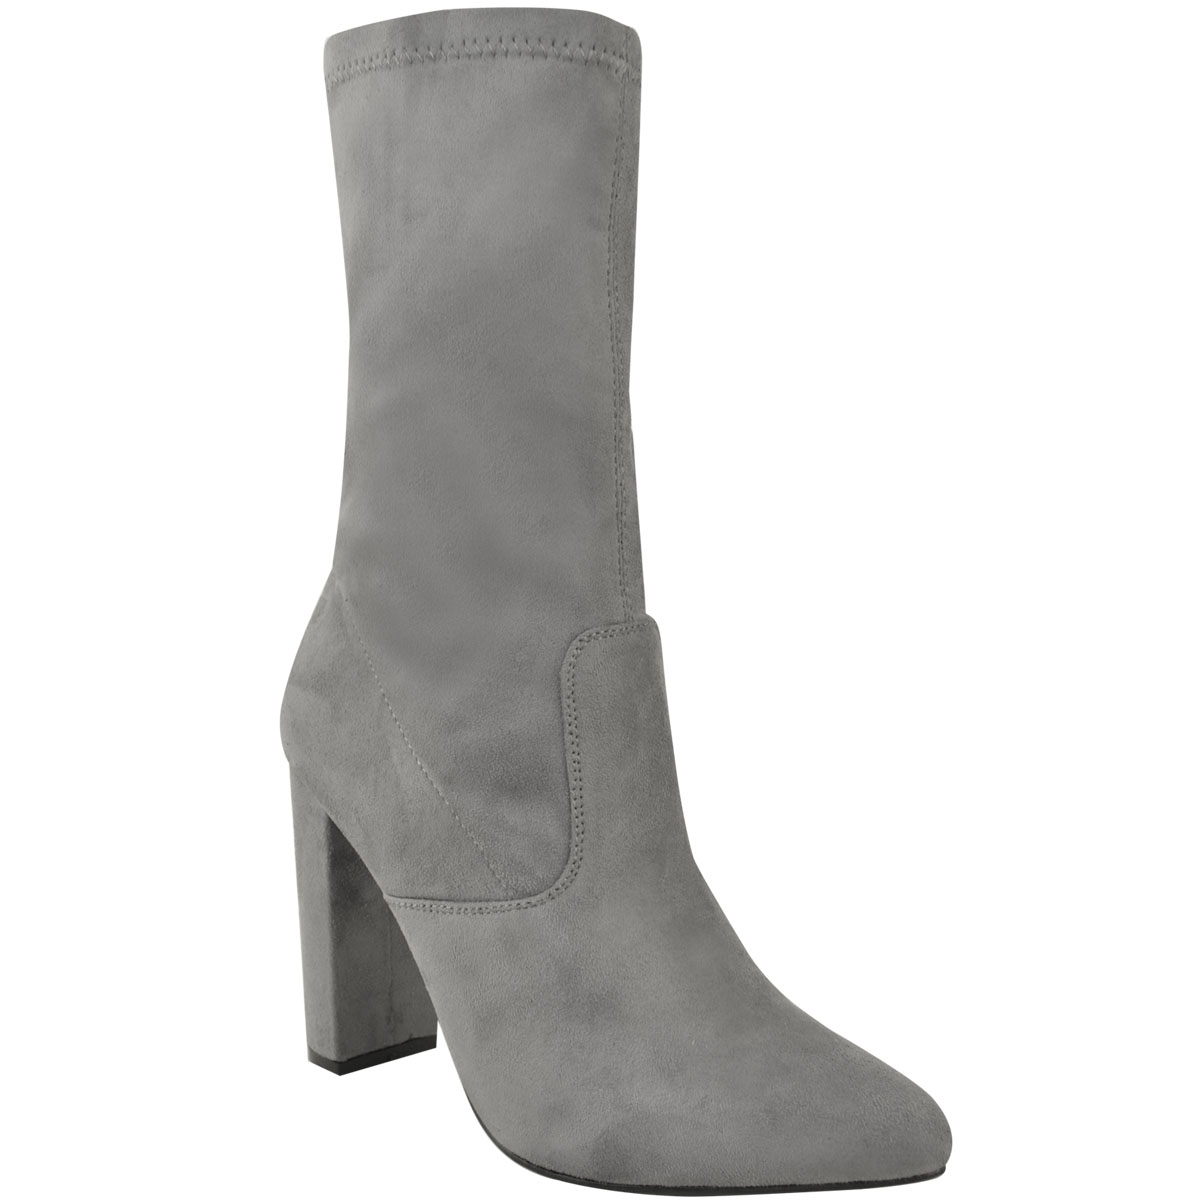 b2e11495e2294 Womens Ladies Long Ankle Boots Block Calf High Heels Casual Evening ...